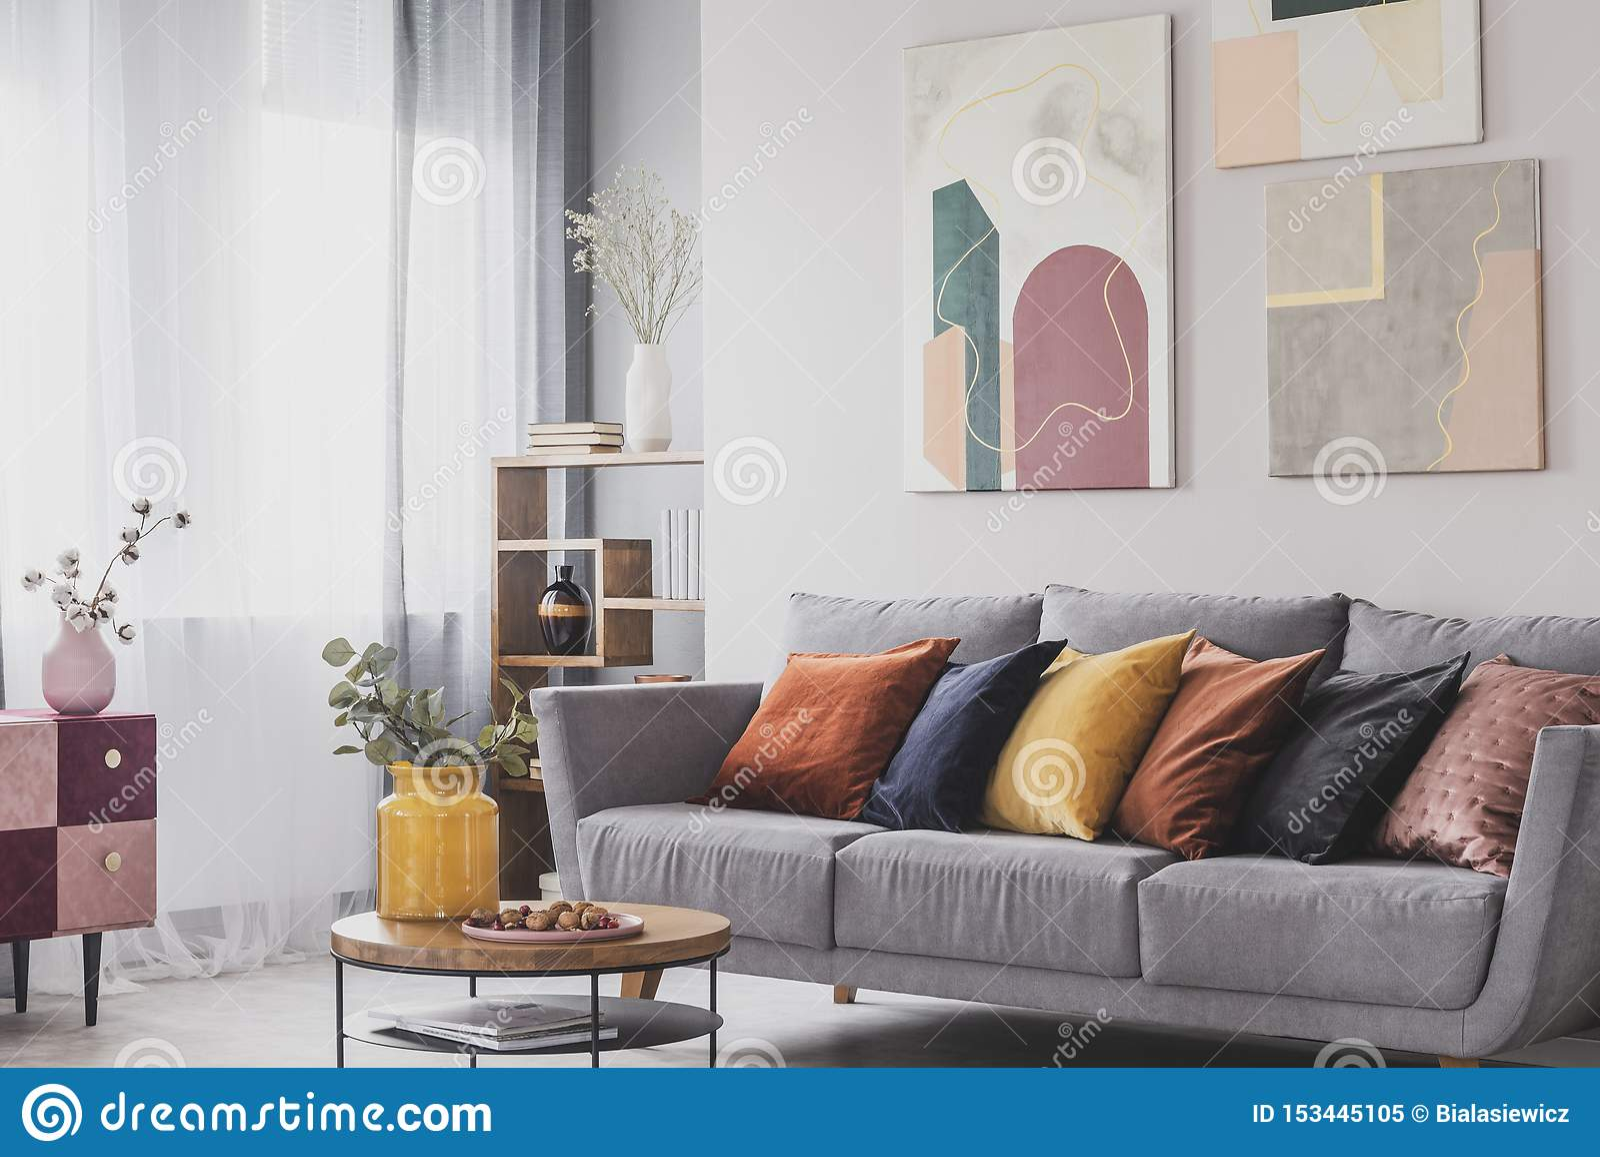 Yellow Orange Black And Brown Pillows On Comfortable Grey